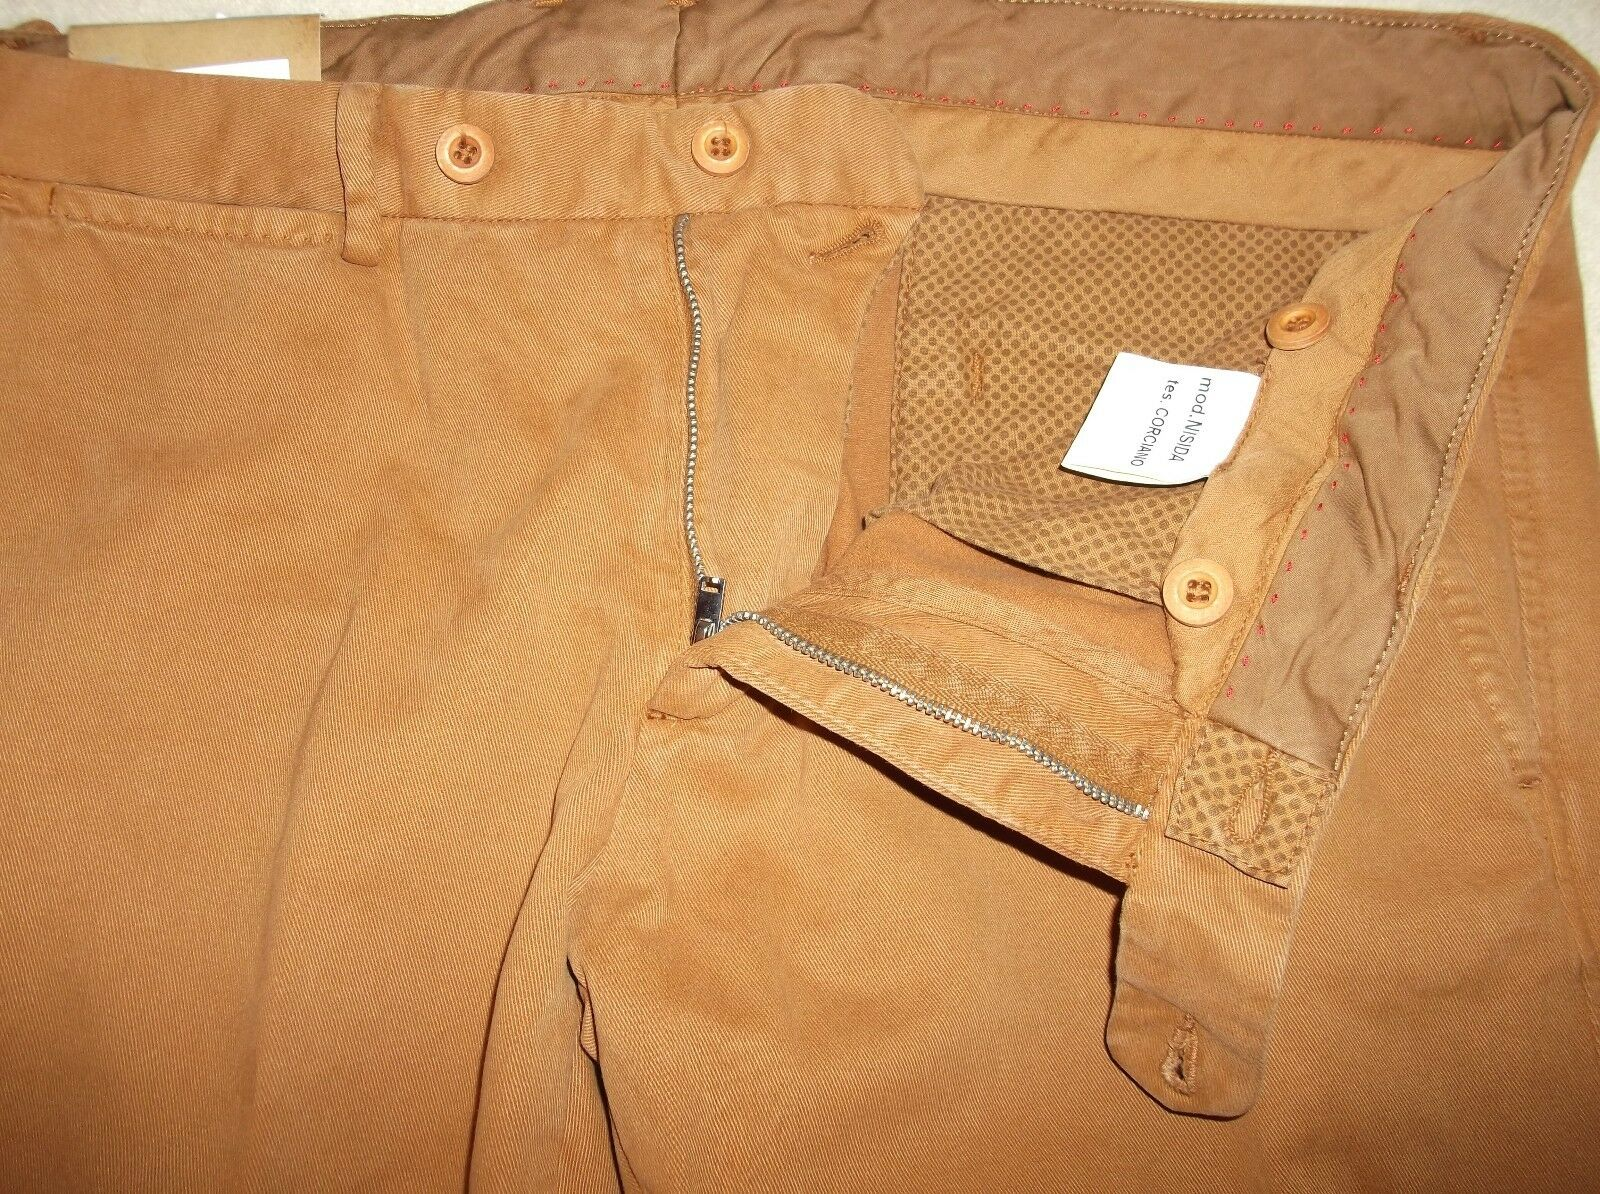 La vendita Marco pescarolo napoli EU 48 33L ITALIANO (KITON (KITON (KITON Pantaloni MAKER) 353c99